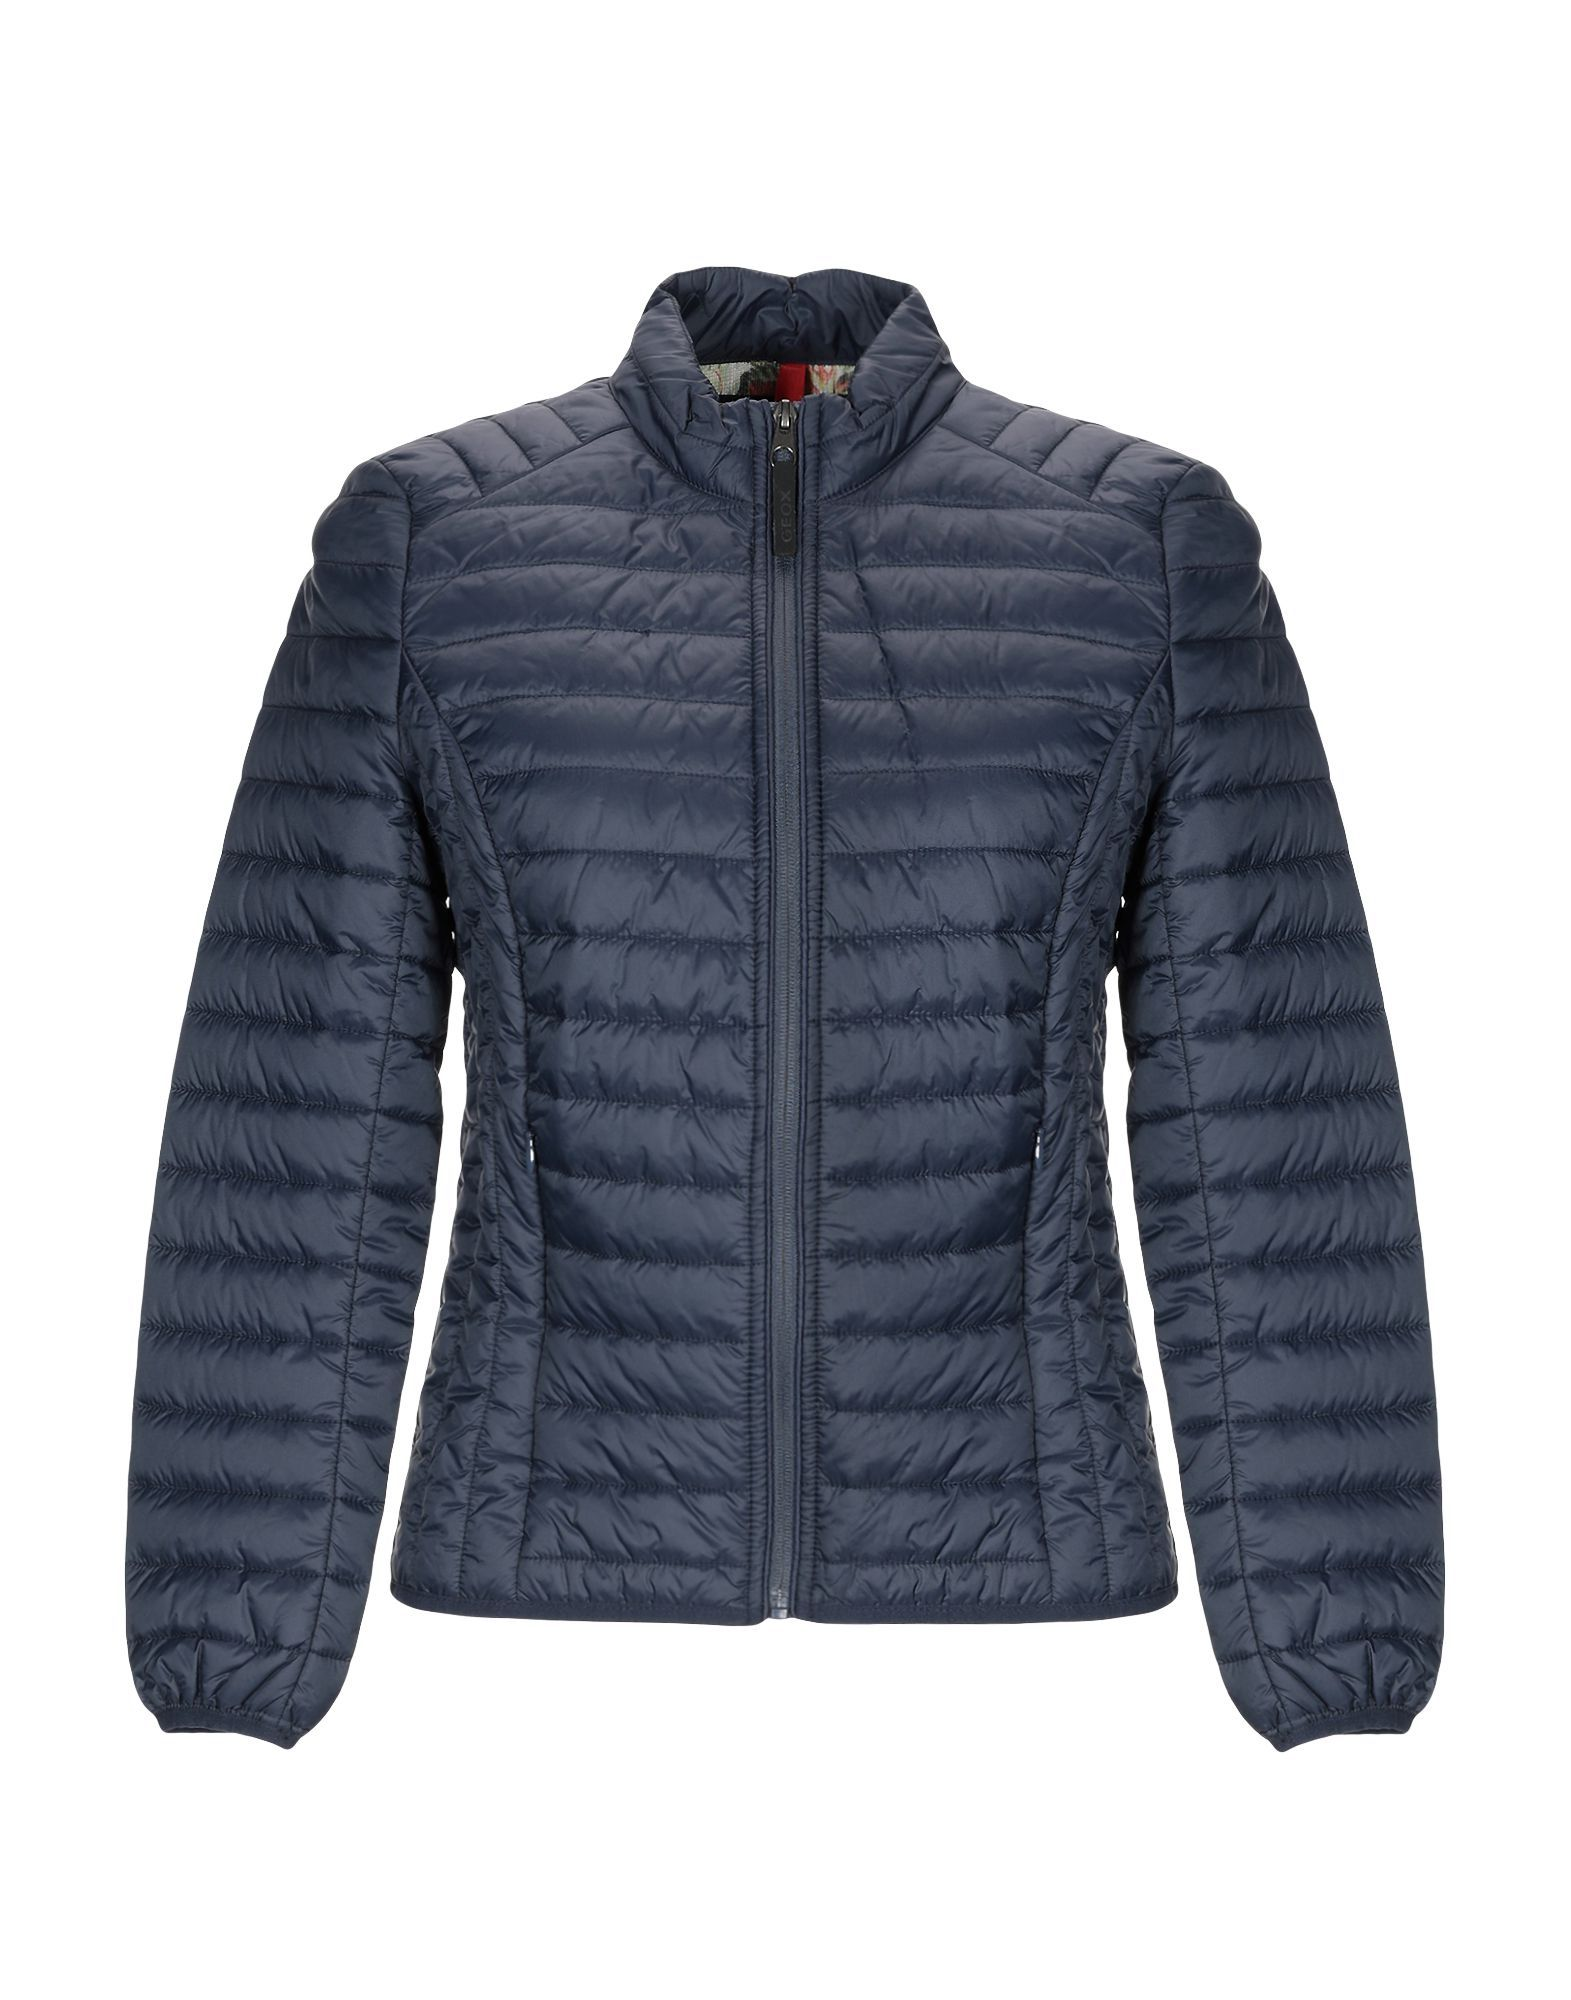 Geox Dark Blue Techno Fabric Jacket